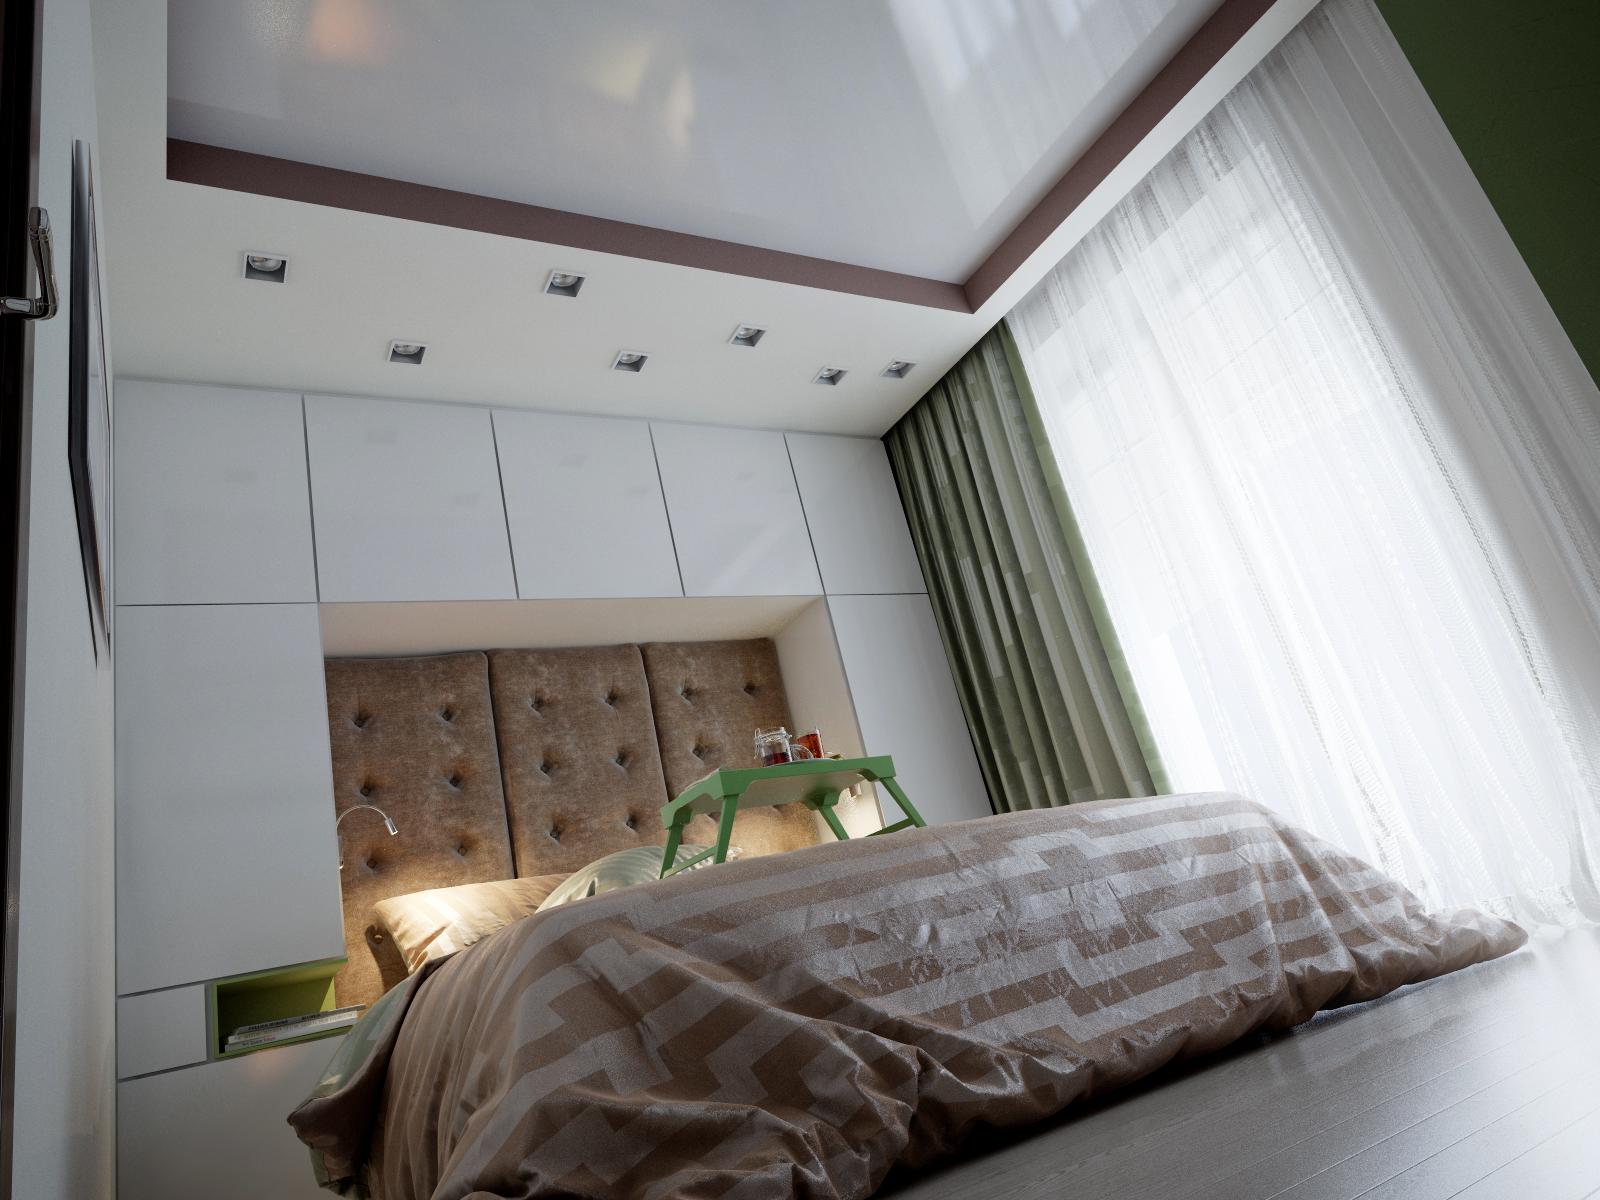 Квартира студия дизайн минимализм